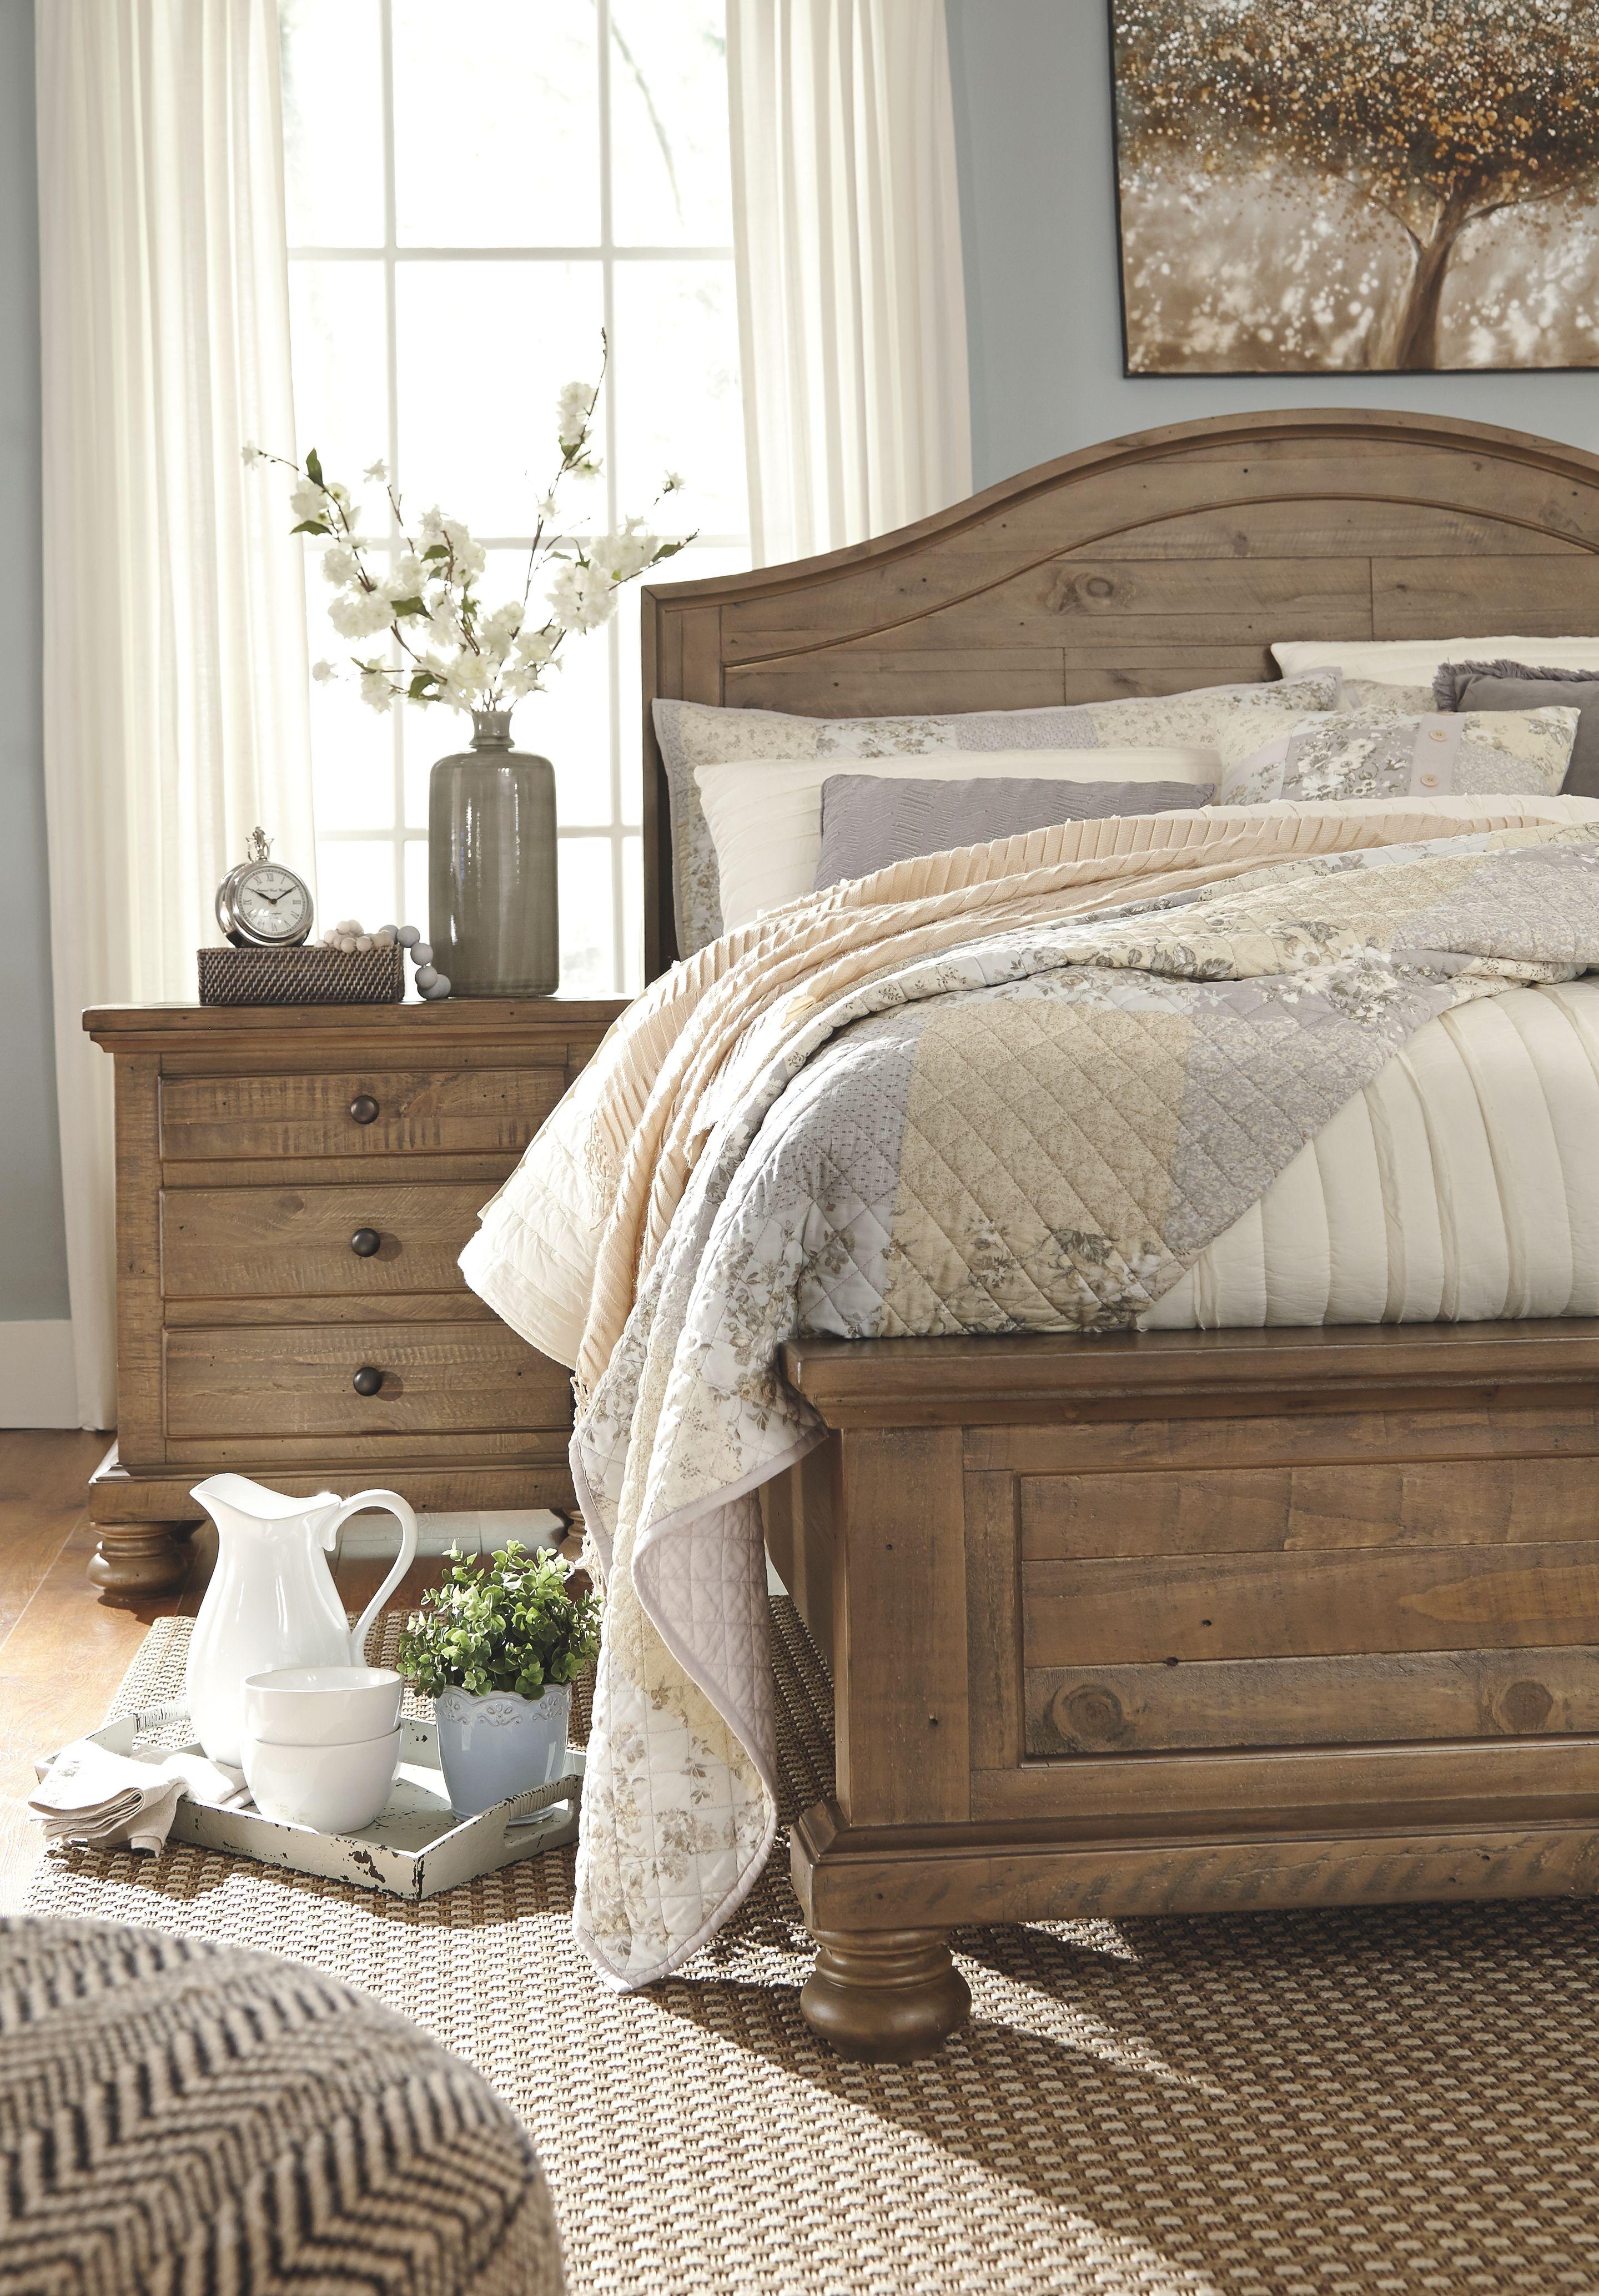 Trishley Nightstand Light Brown In 2019 Bedroom Furniture Sets Bedroom Furniture Cozy Bedroom